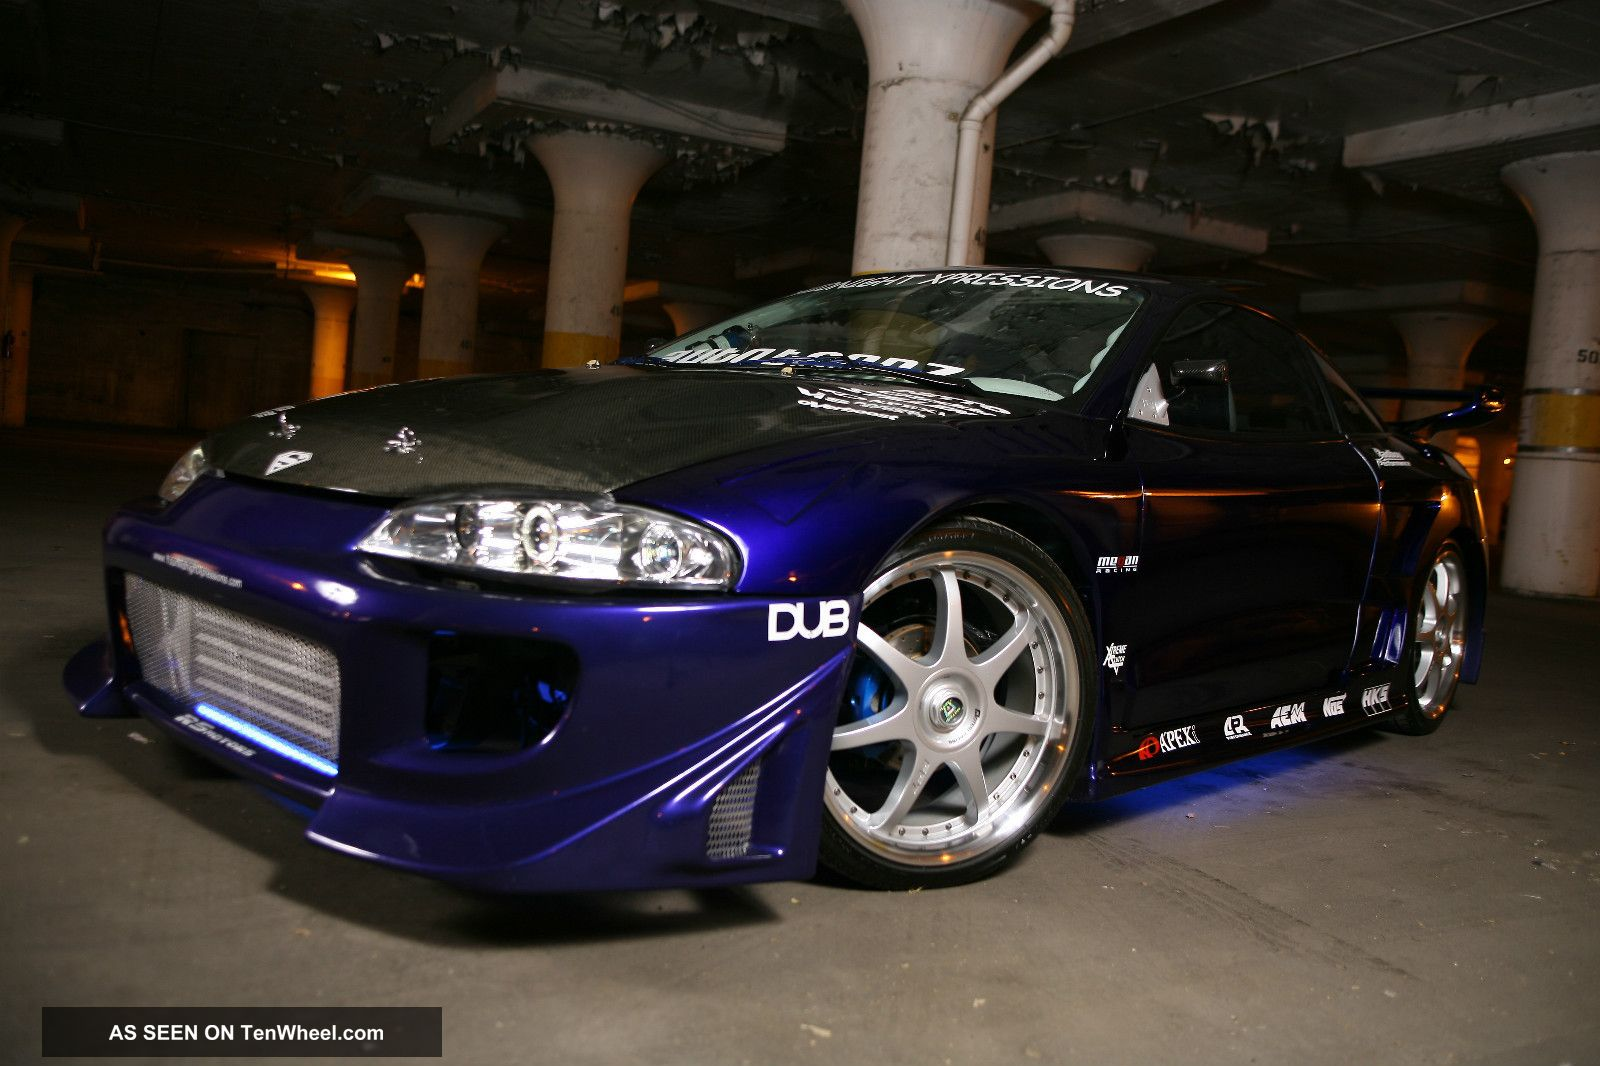 Gst Dr Eclipse Mitsubishi 1998 1998 Eclipse Turbo Gst 2 Mitsubishi